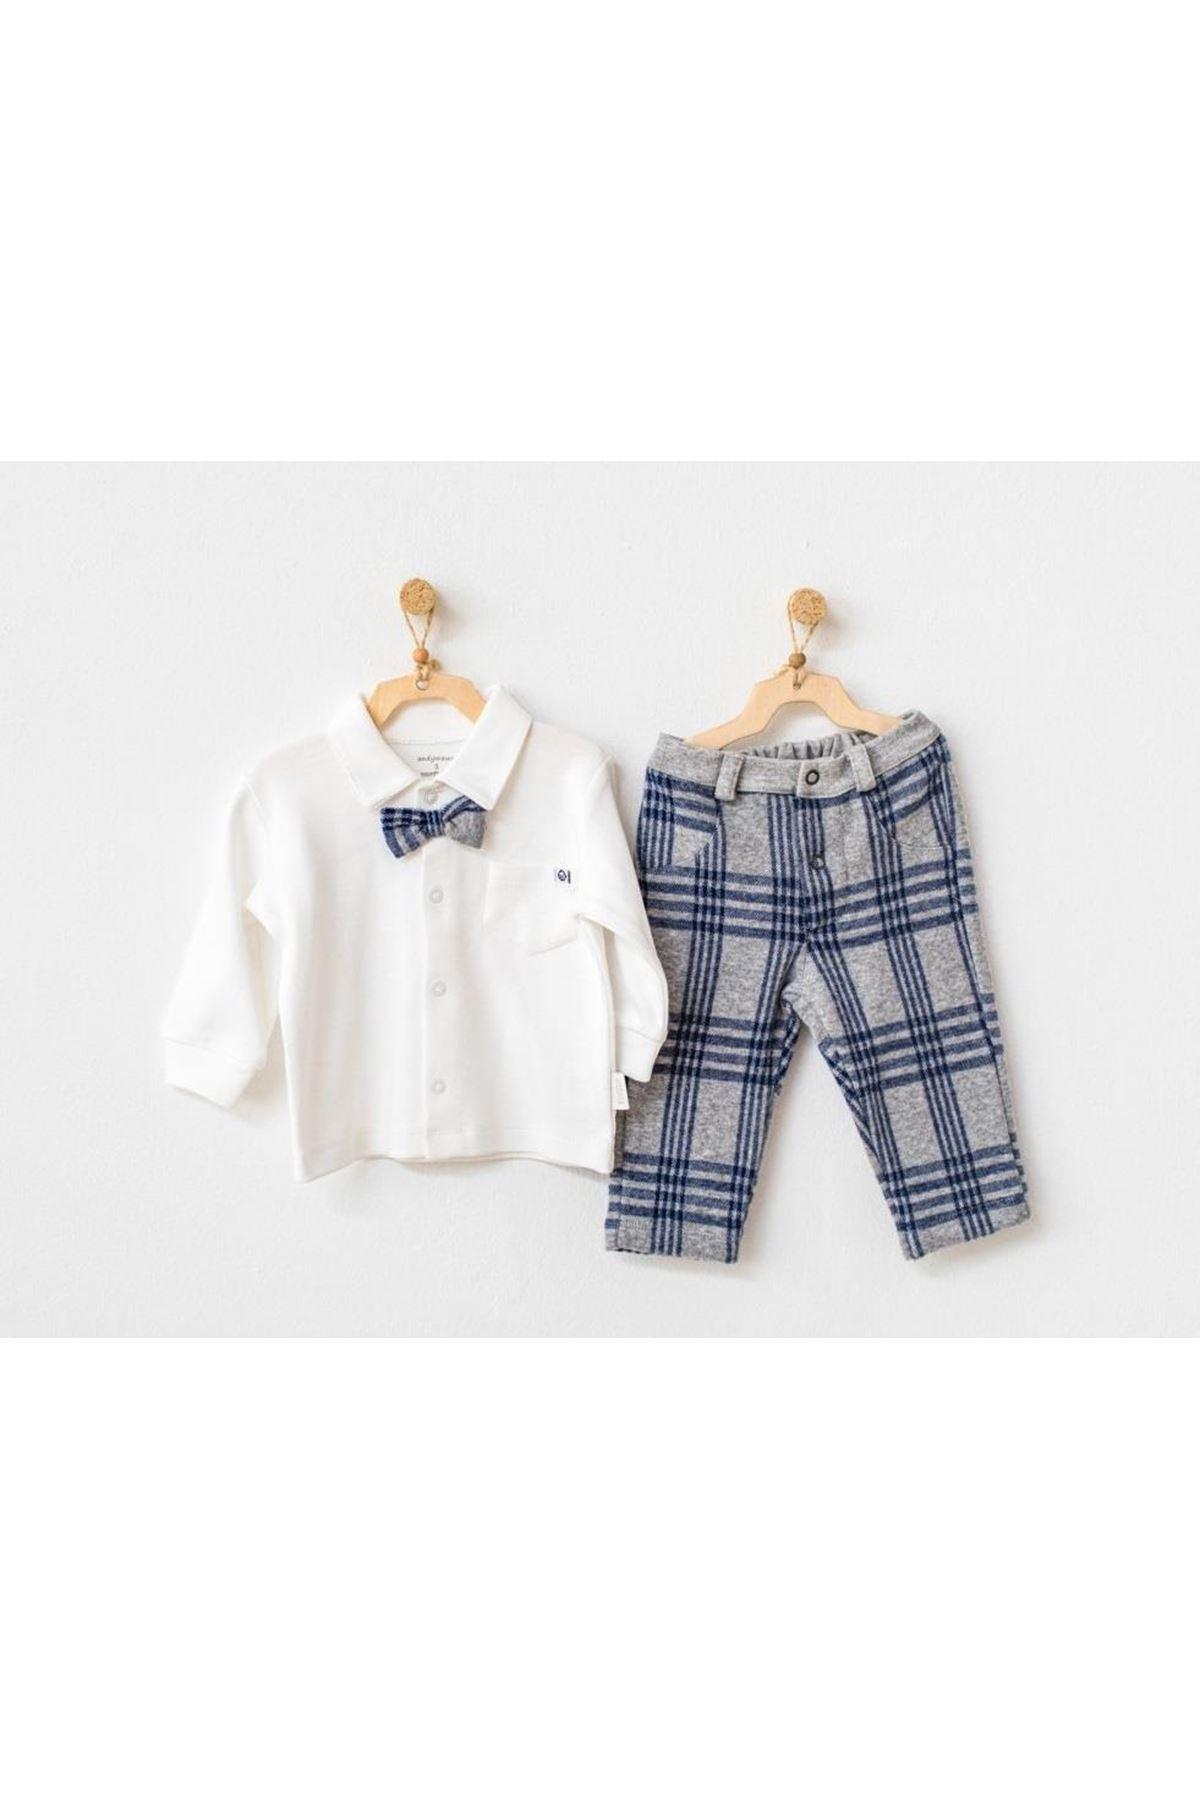 Andywawa AC21153 Awesome 2li Bebek Takım Ekru